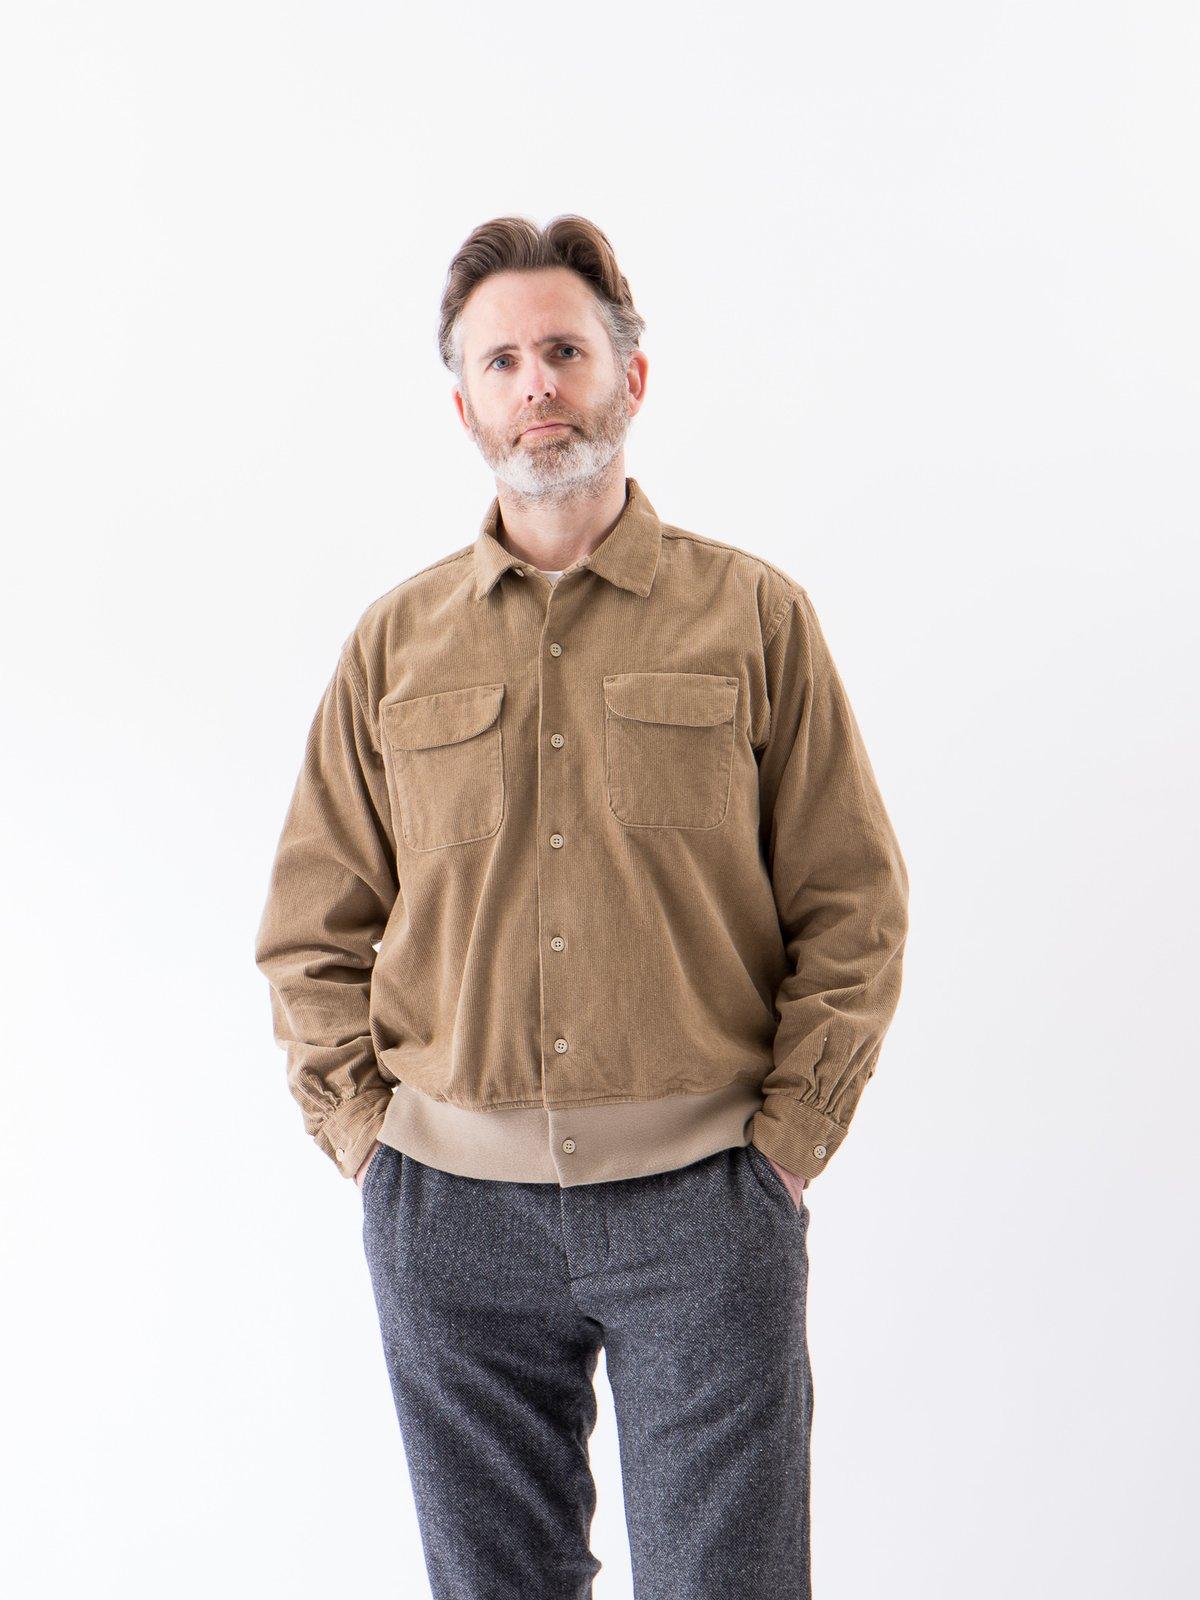 Khaki 14W Corduroy Classic Shirt - Image 2